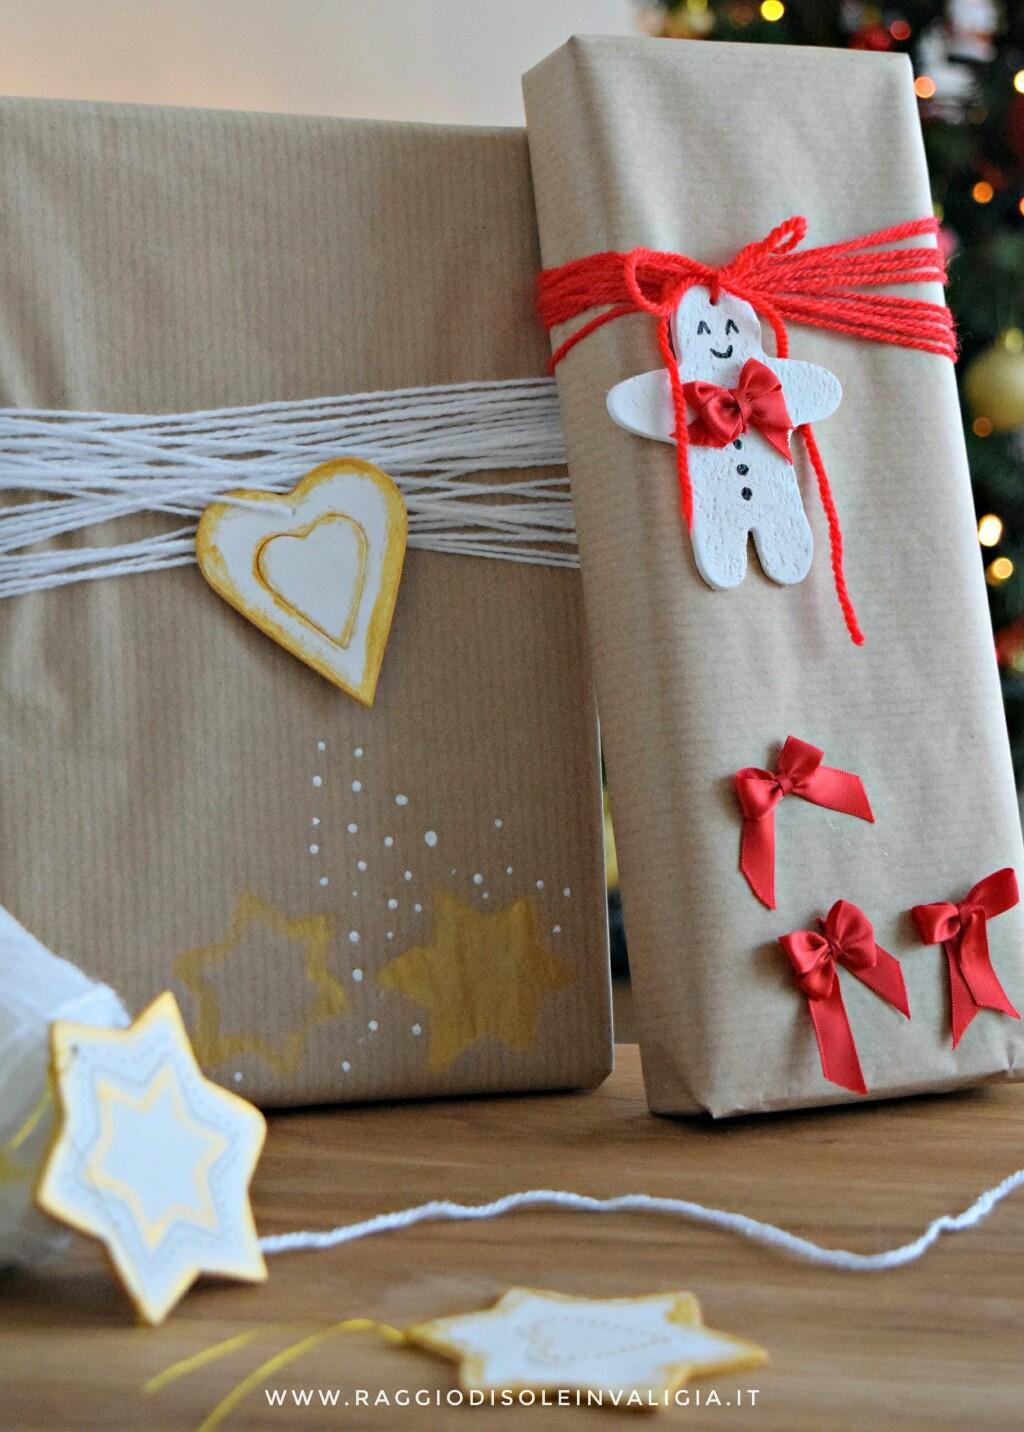 packaging natalizio fai da te